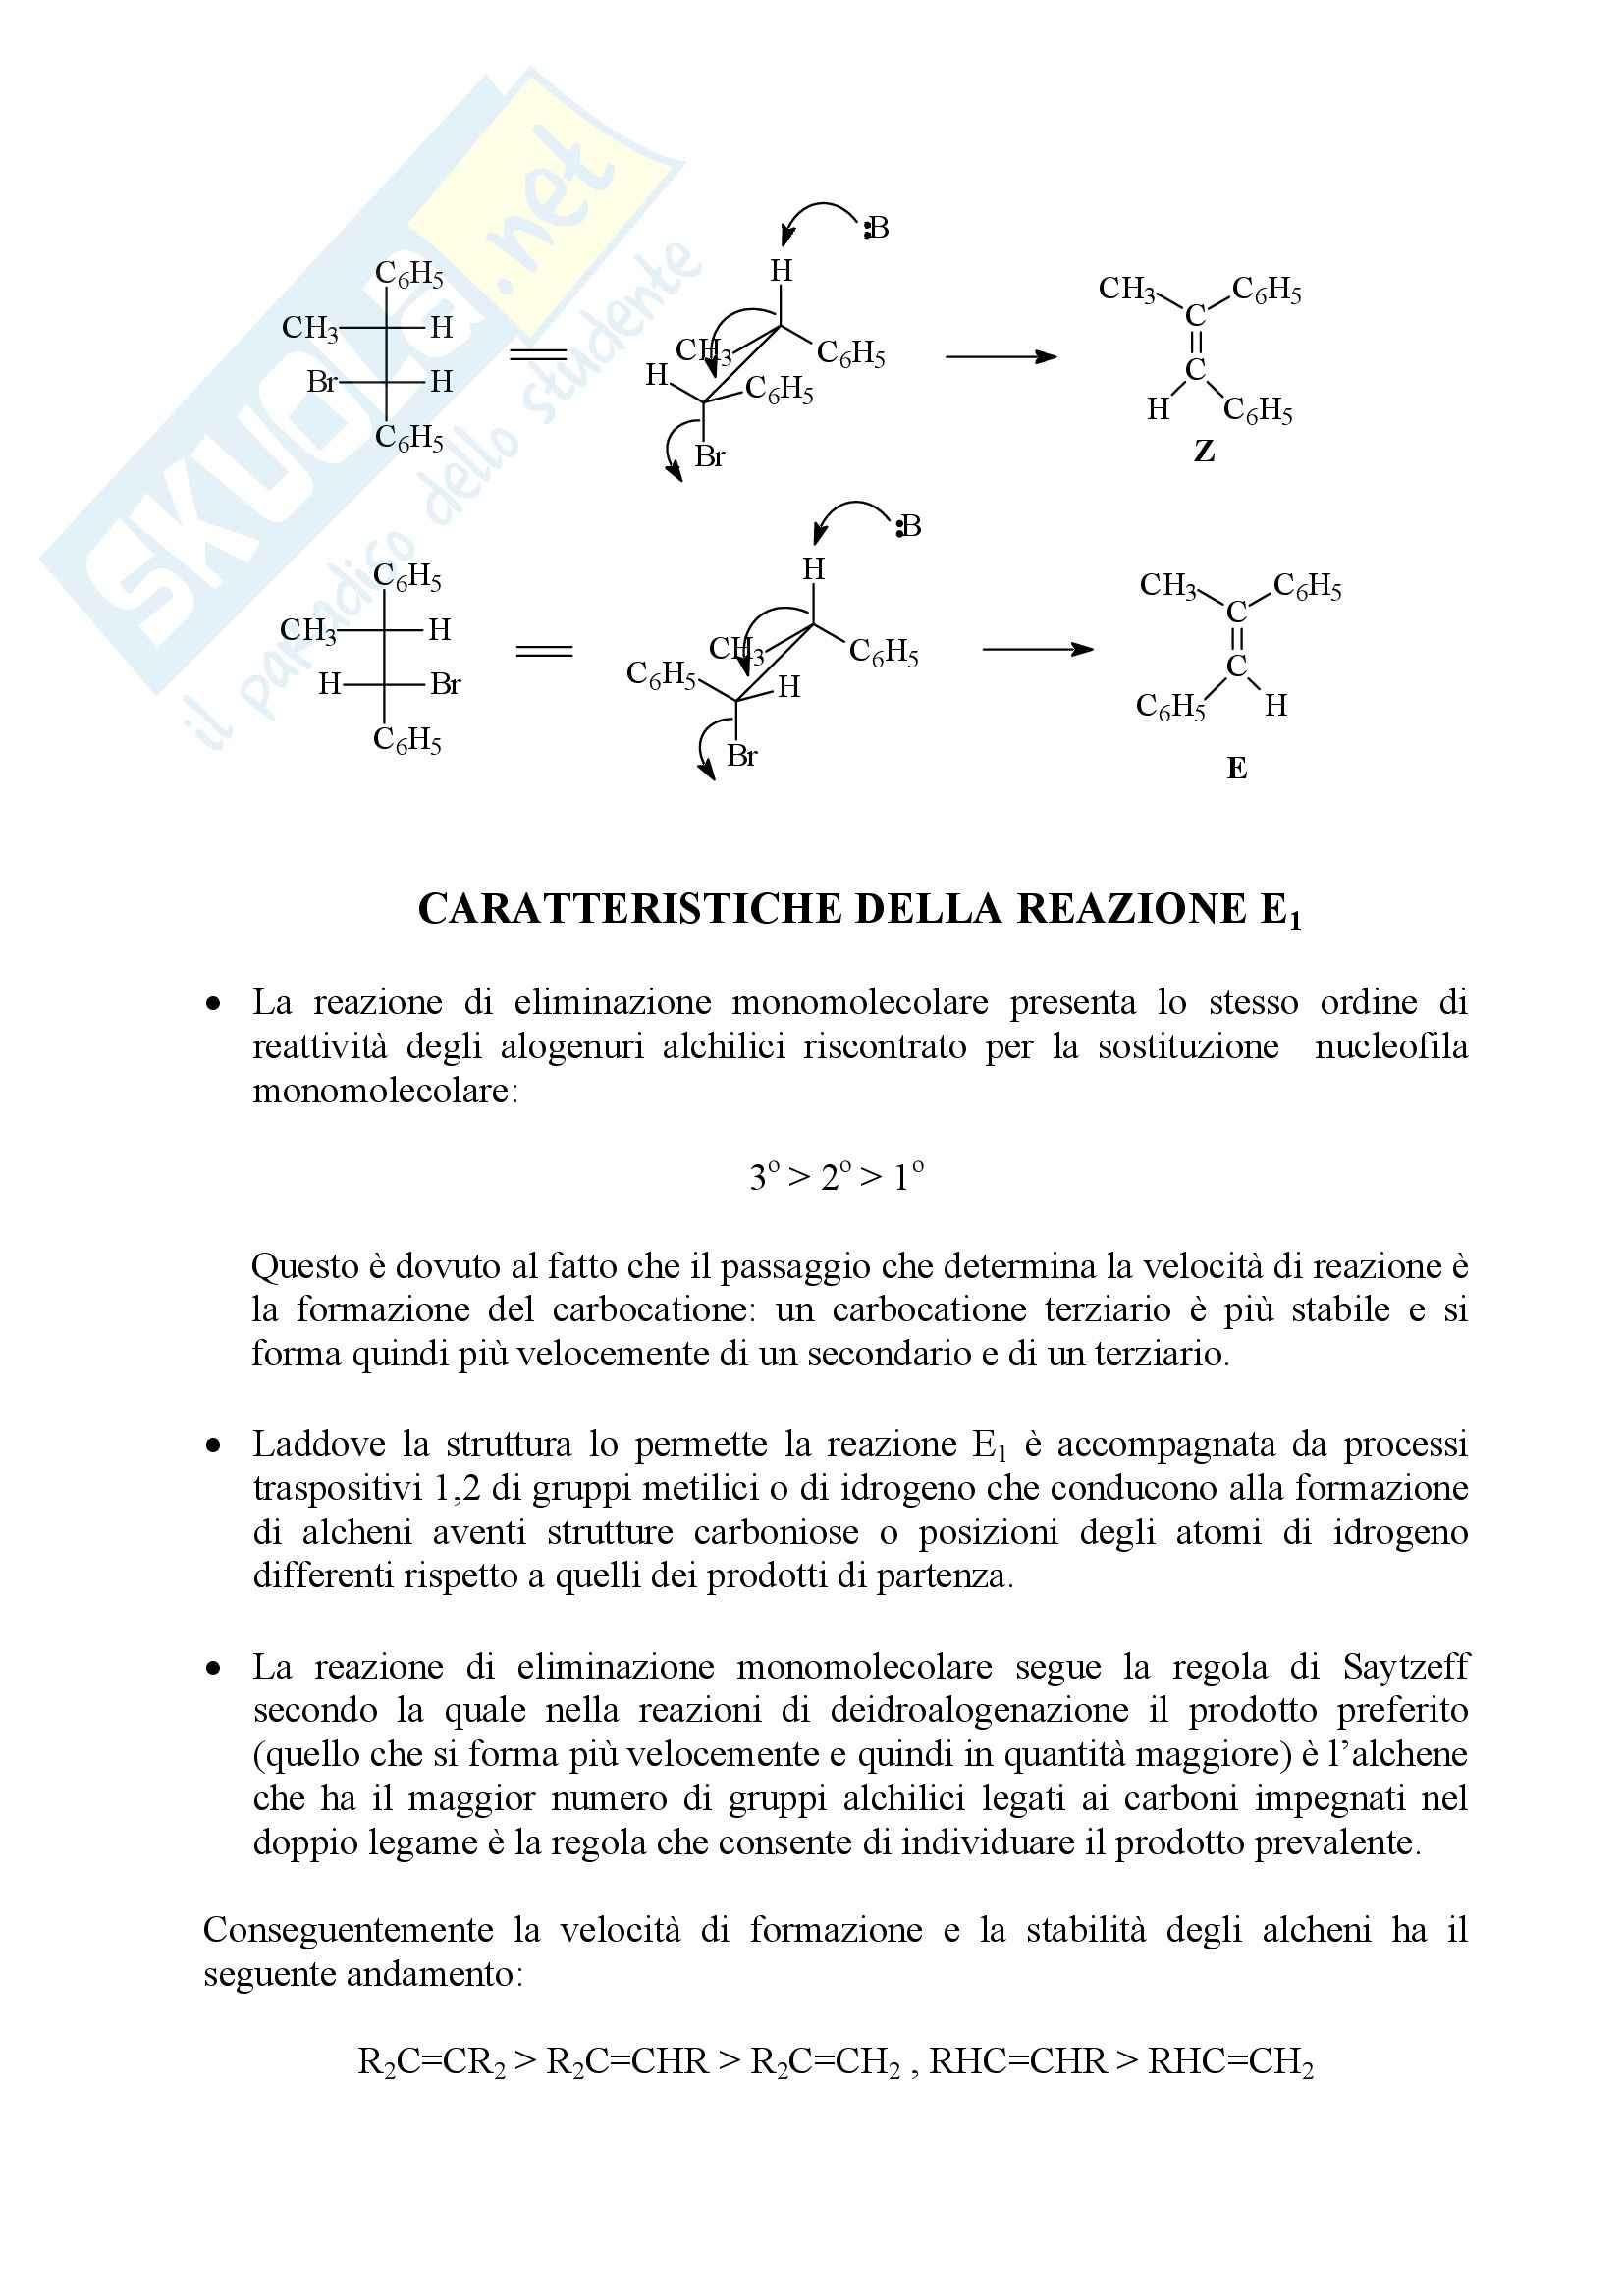 Chimica organica - Appunti Pag. 31